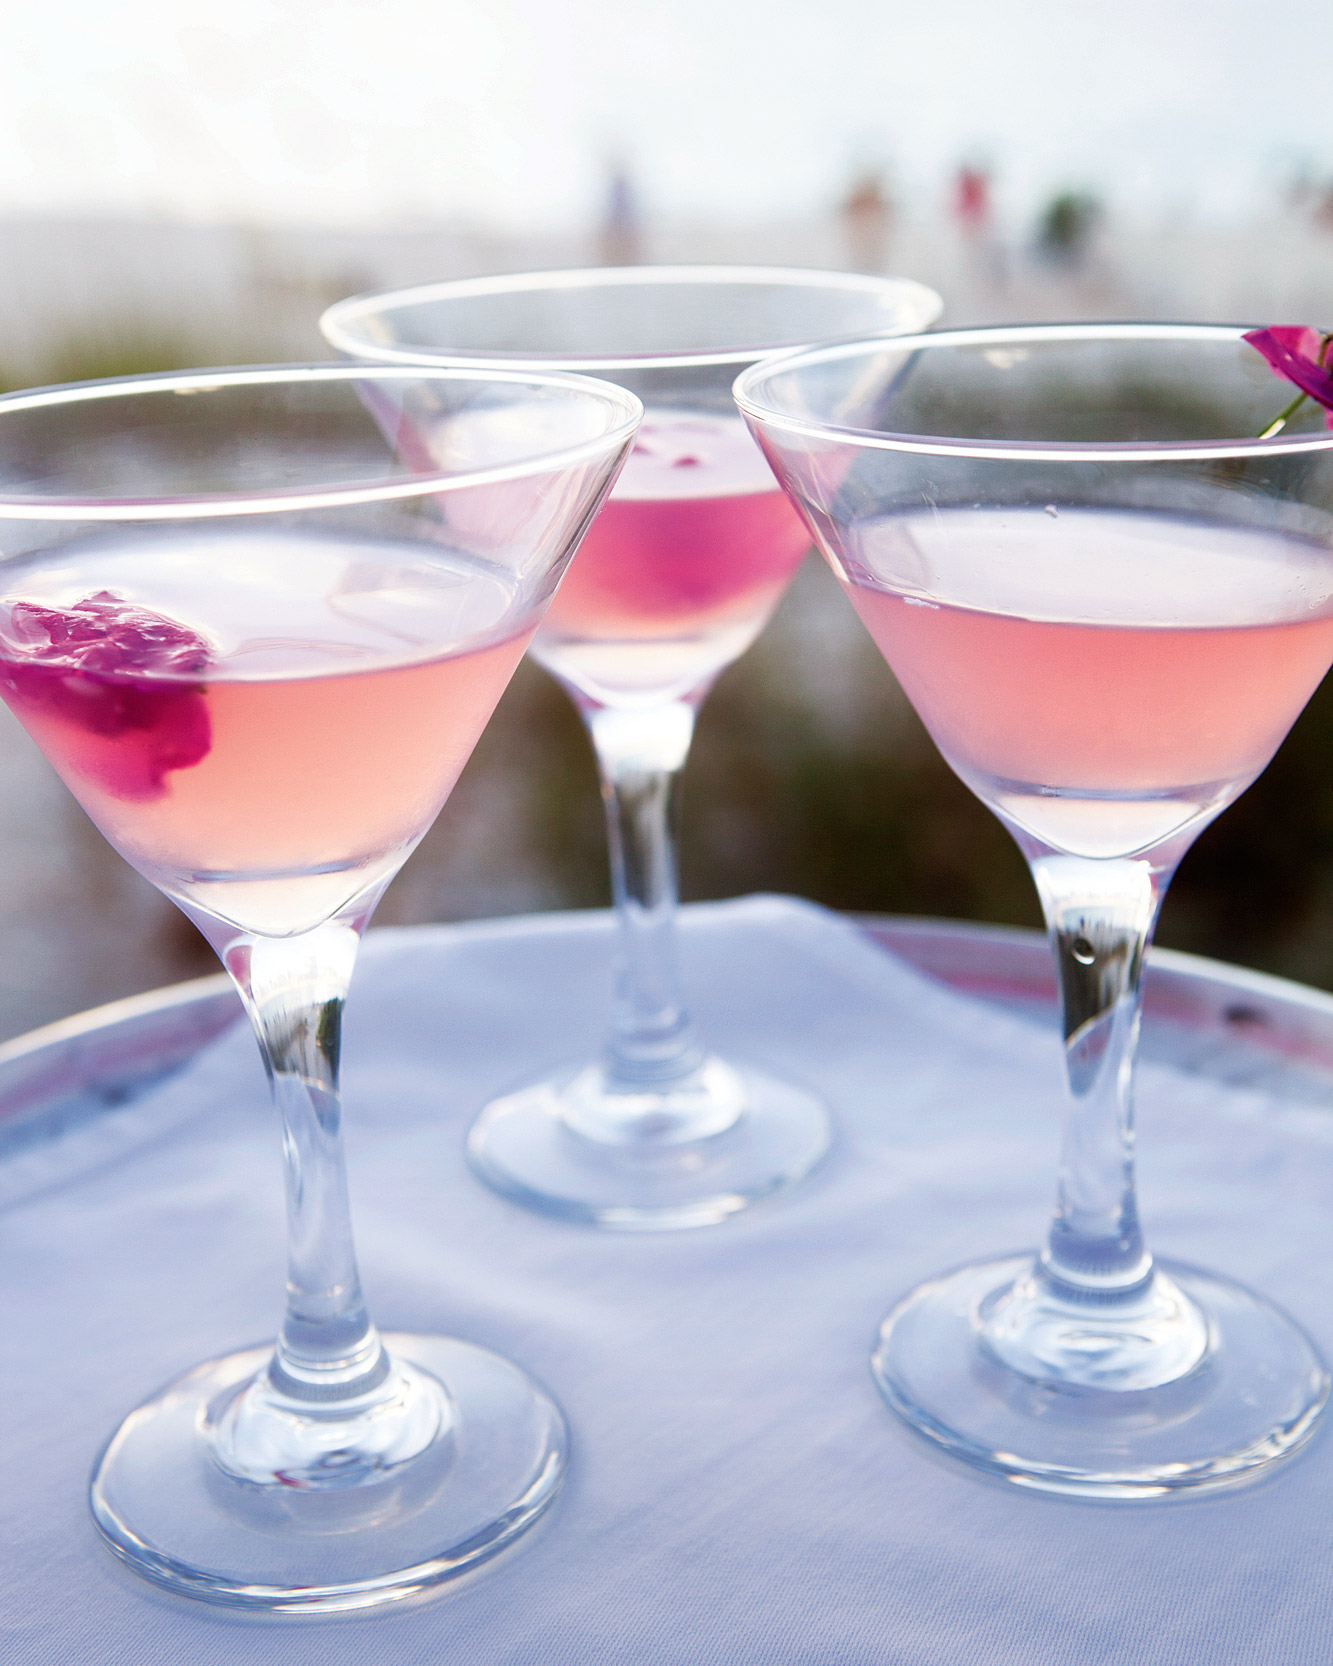 rw-anne-josh-drinks-mwd106057.jpg